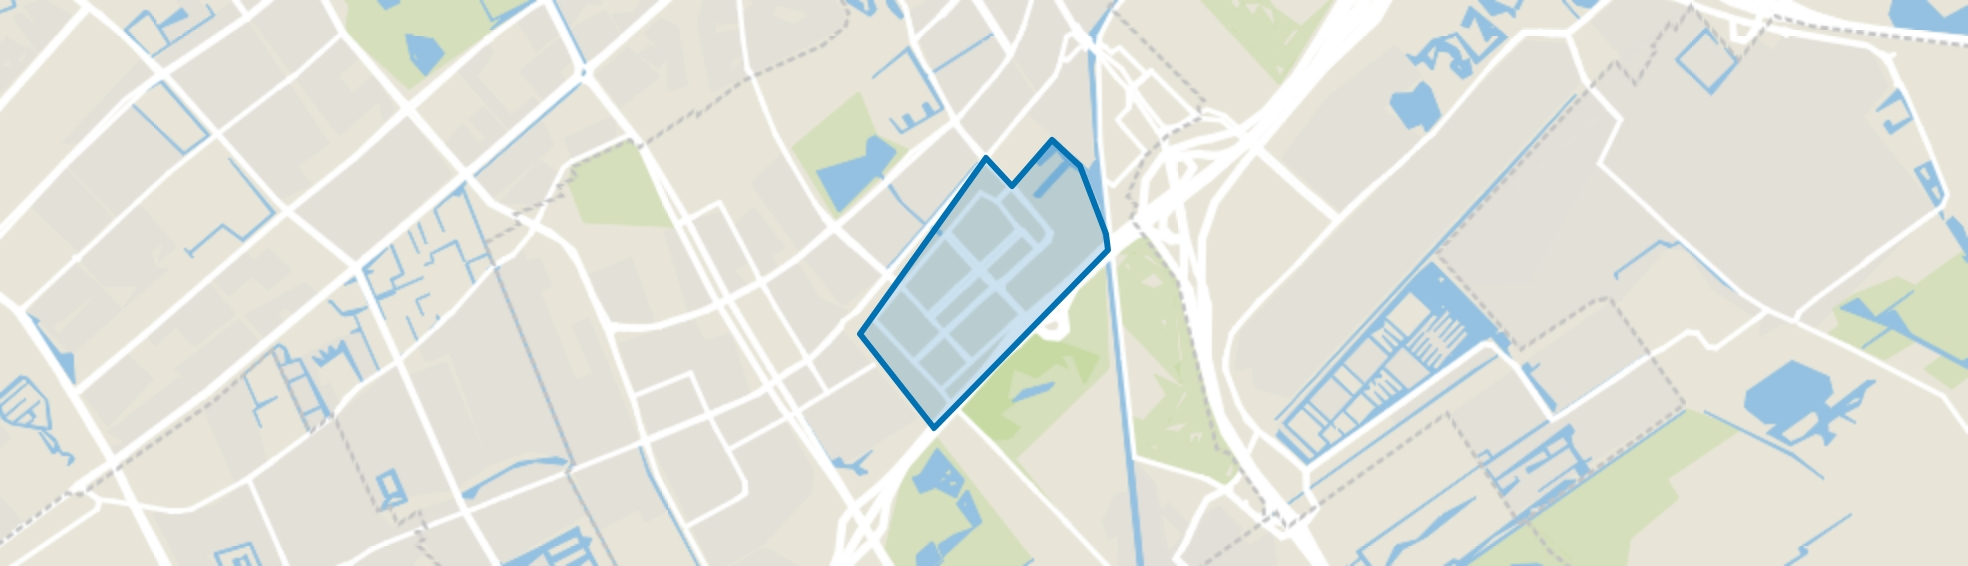 Plaspoelpolder, Rijswijk (ZH) map